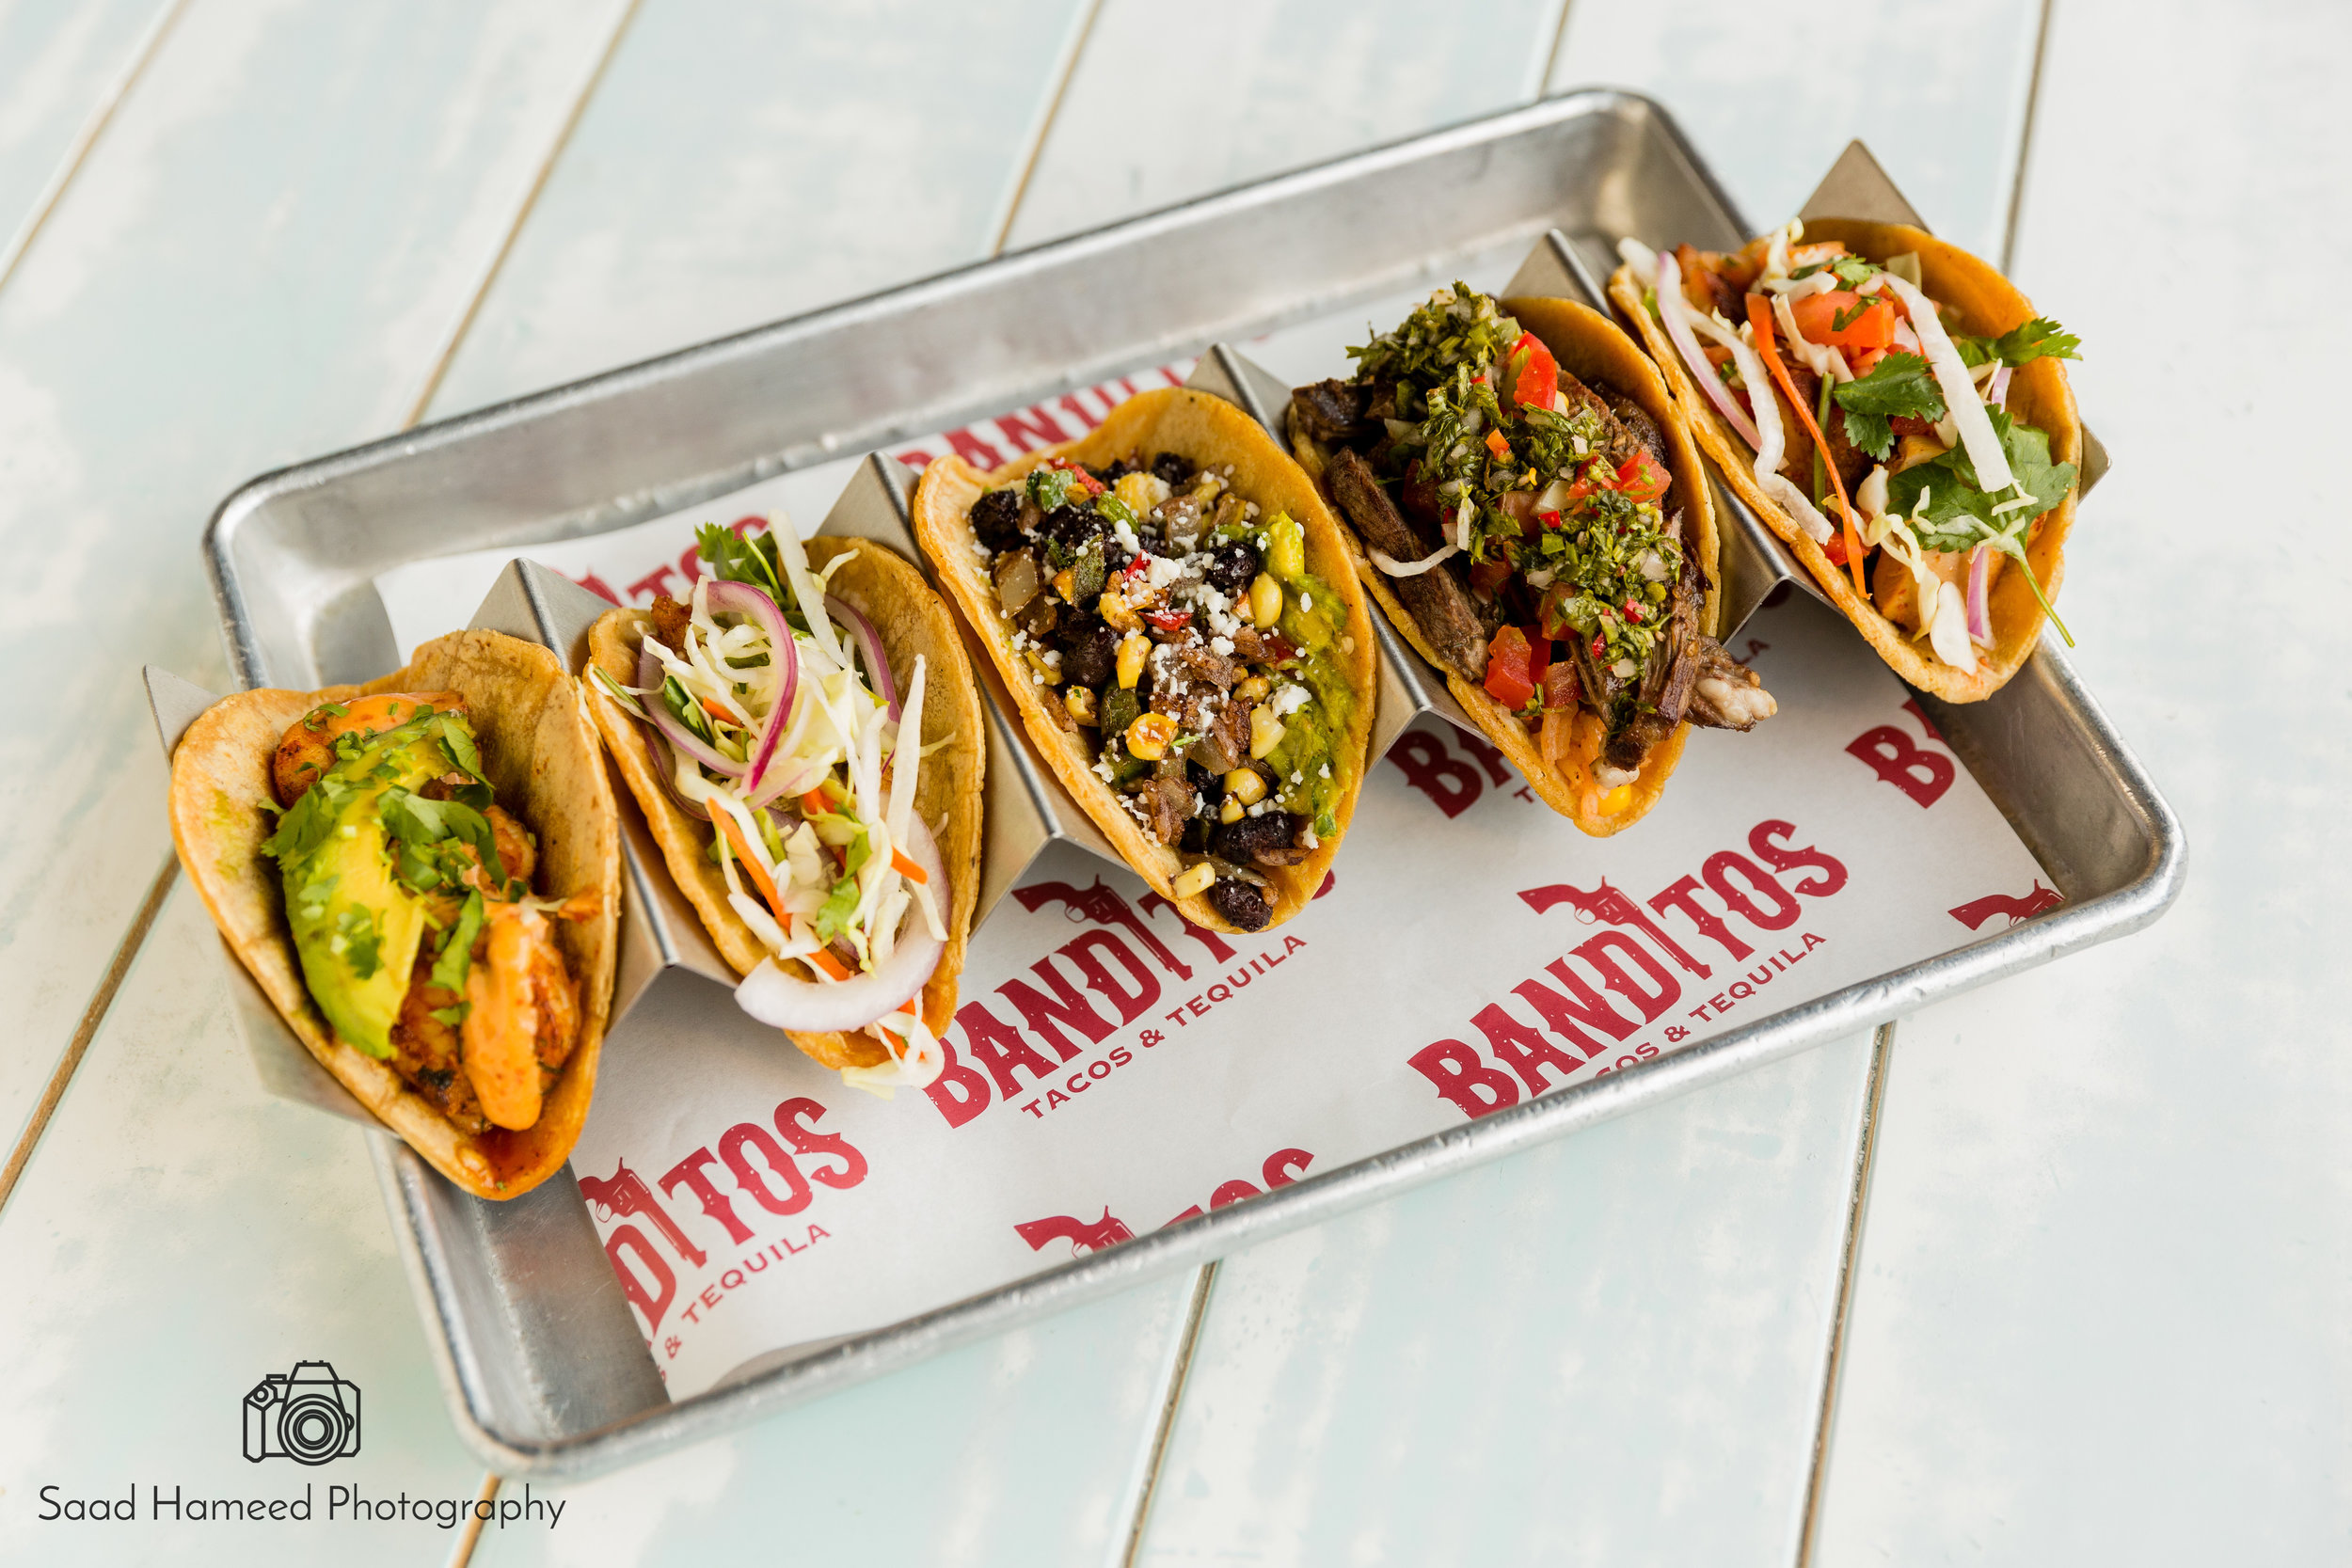 BanditosTacosAndTequila_Tacos_TacoSamplerPlatter_1-Edit.jpg